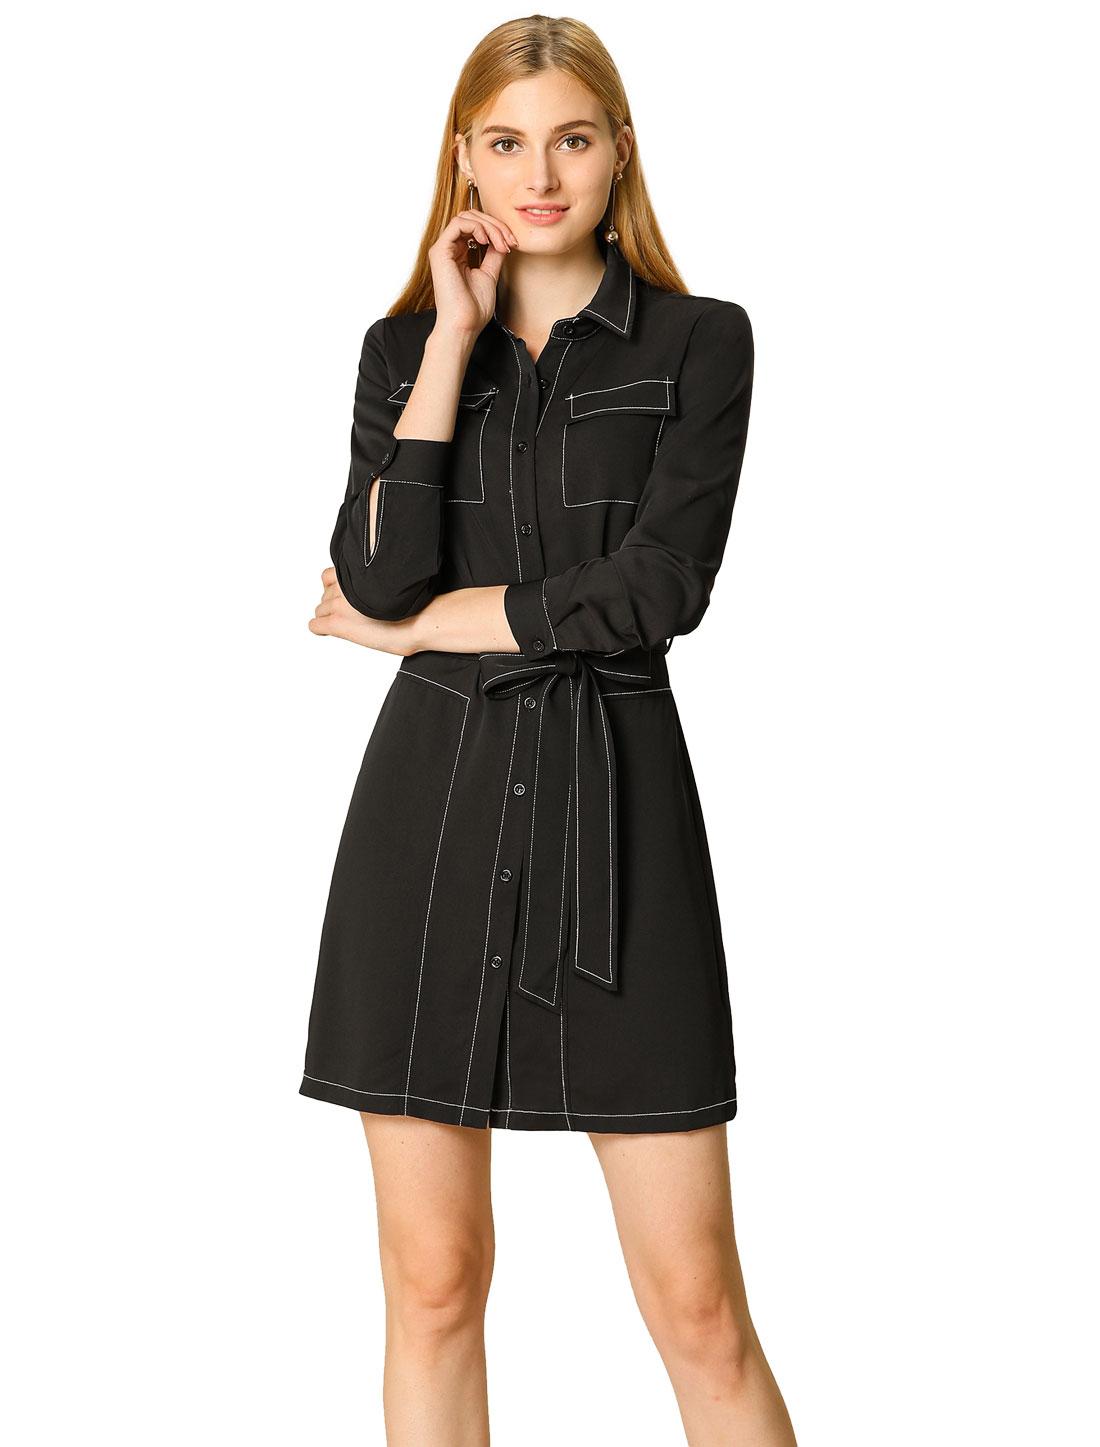 Allegra K Women's Contrast Long Sleeves Belted Waist Dress Black XS